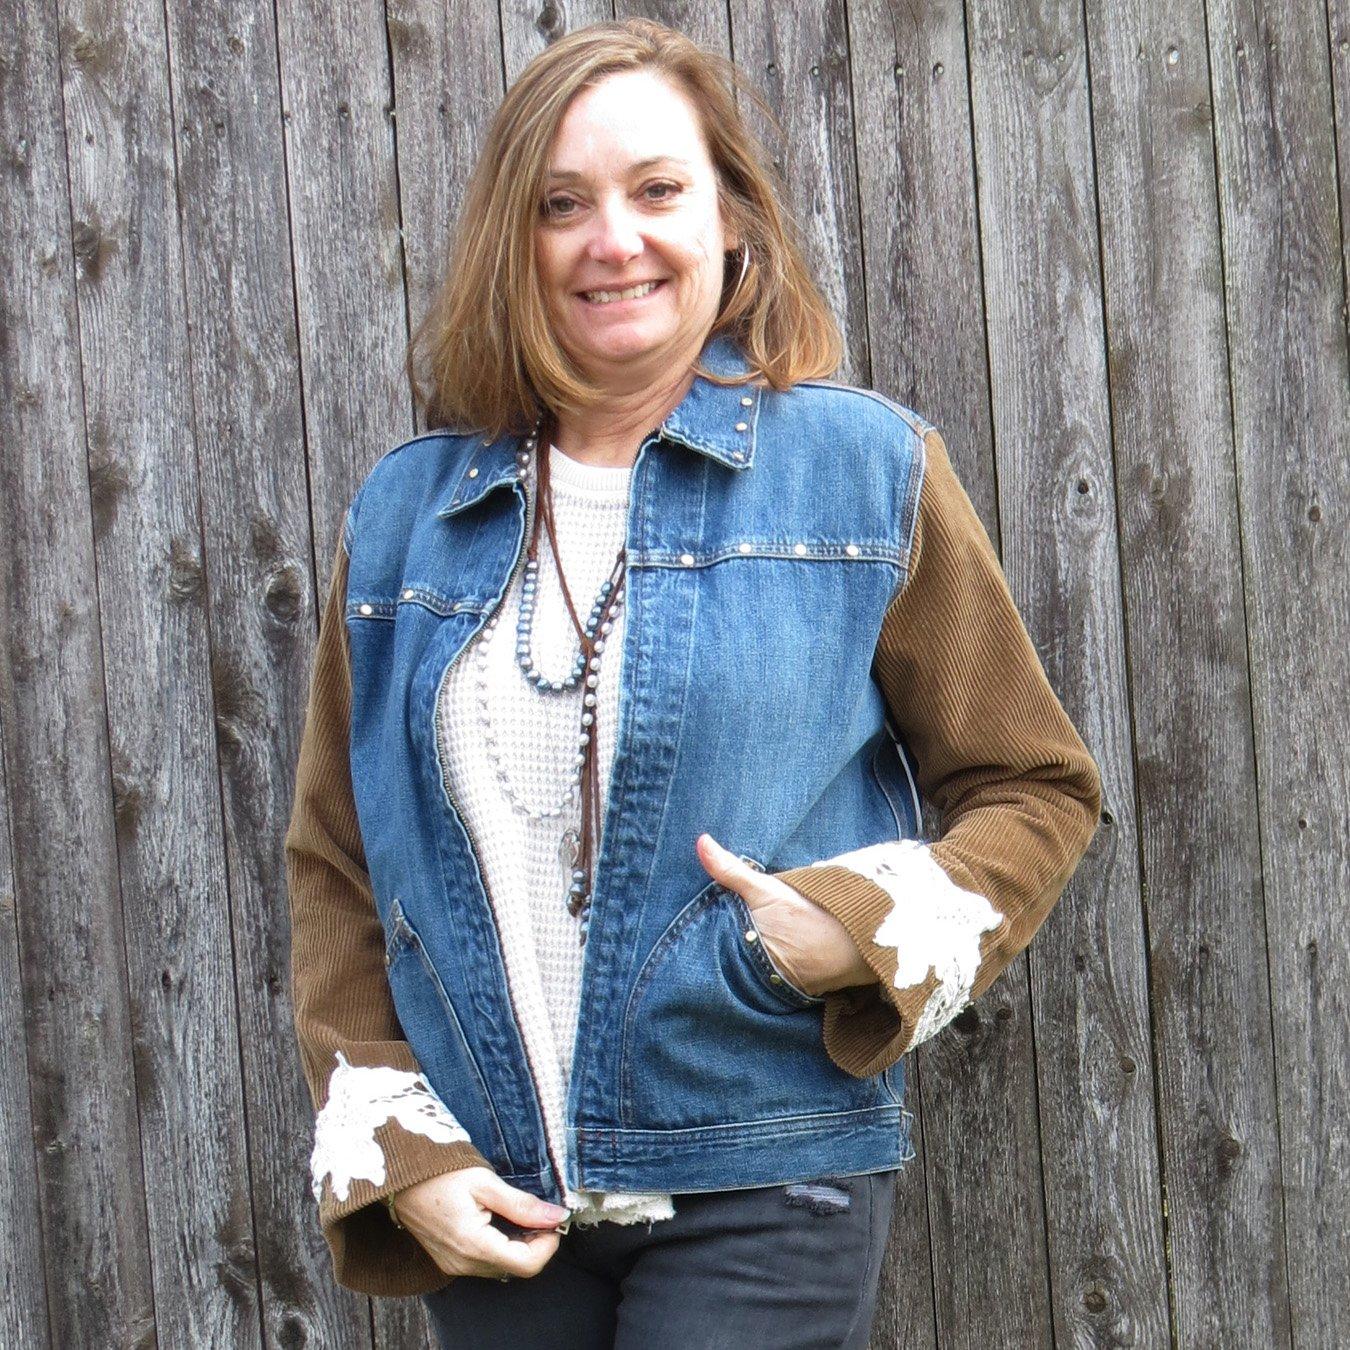 Soft Wide Whale Carmel Corduroy + Lace Sleeved Mixed Media Zip Denim Jacket